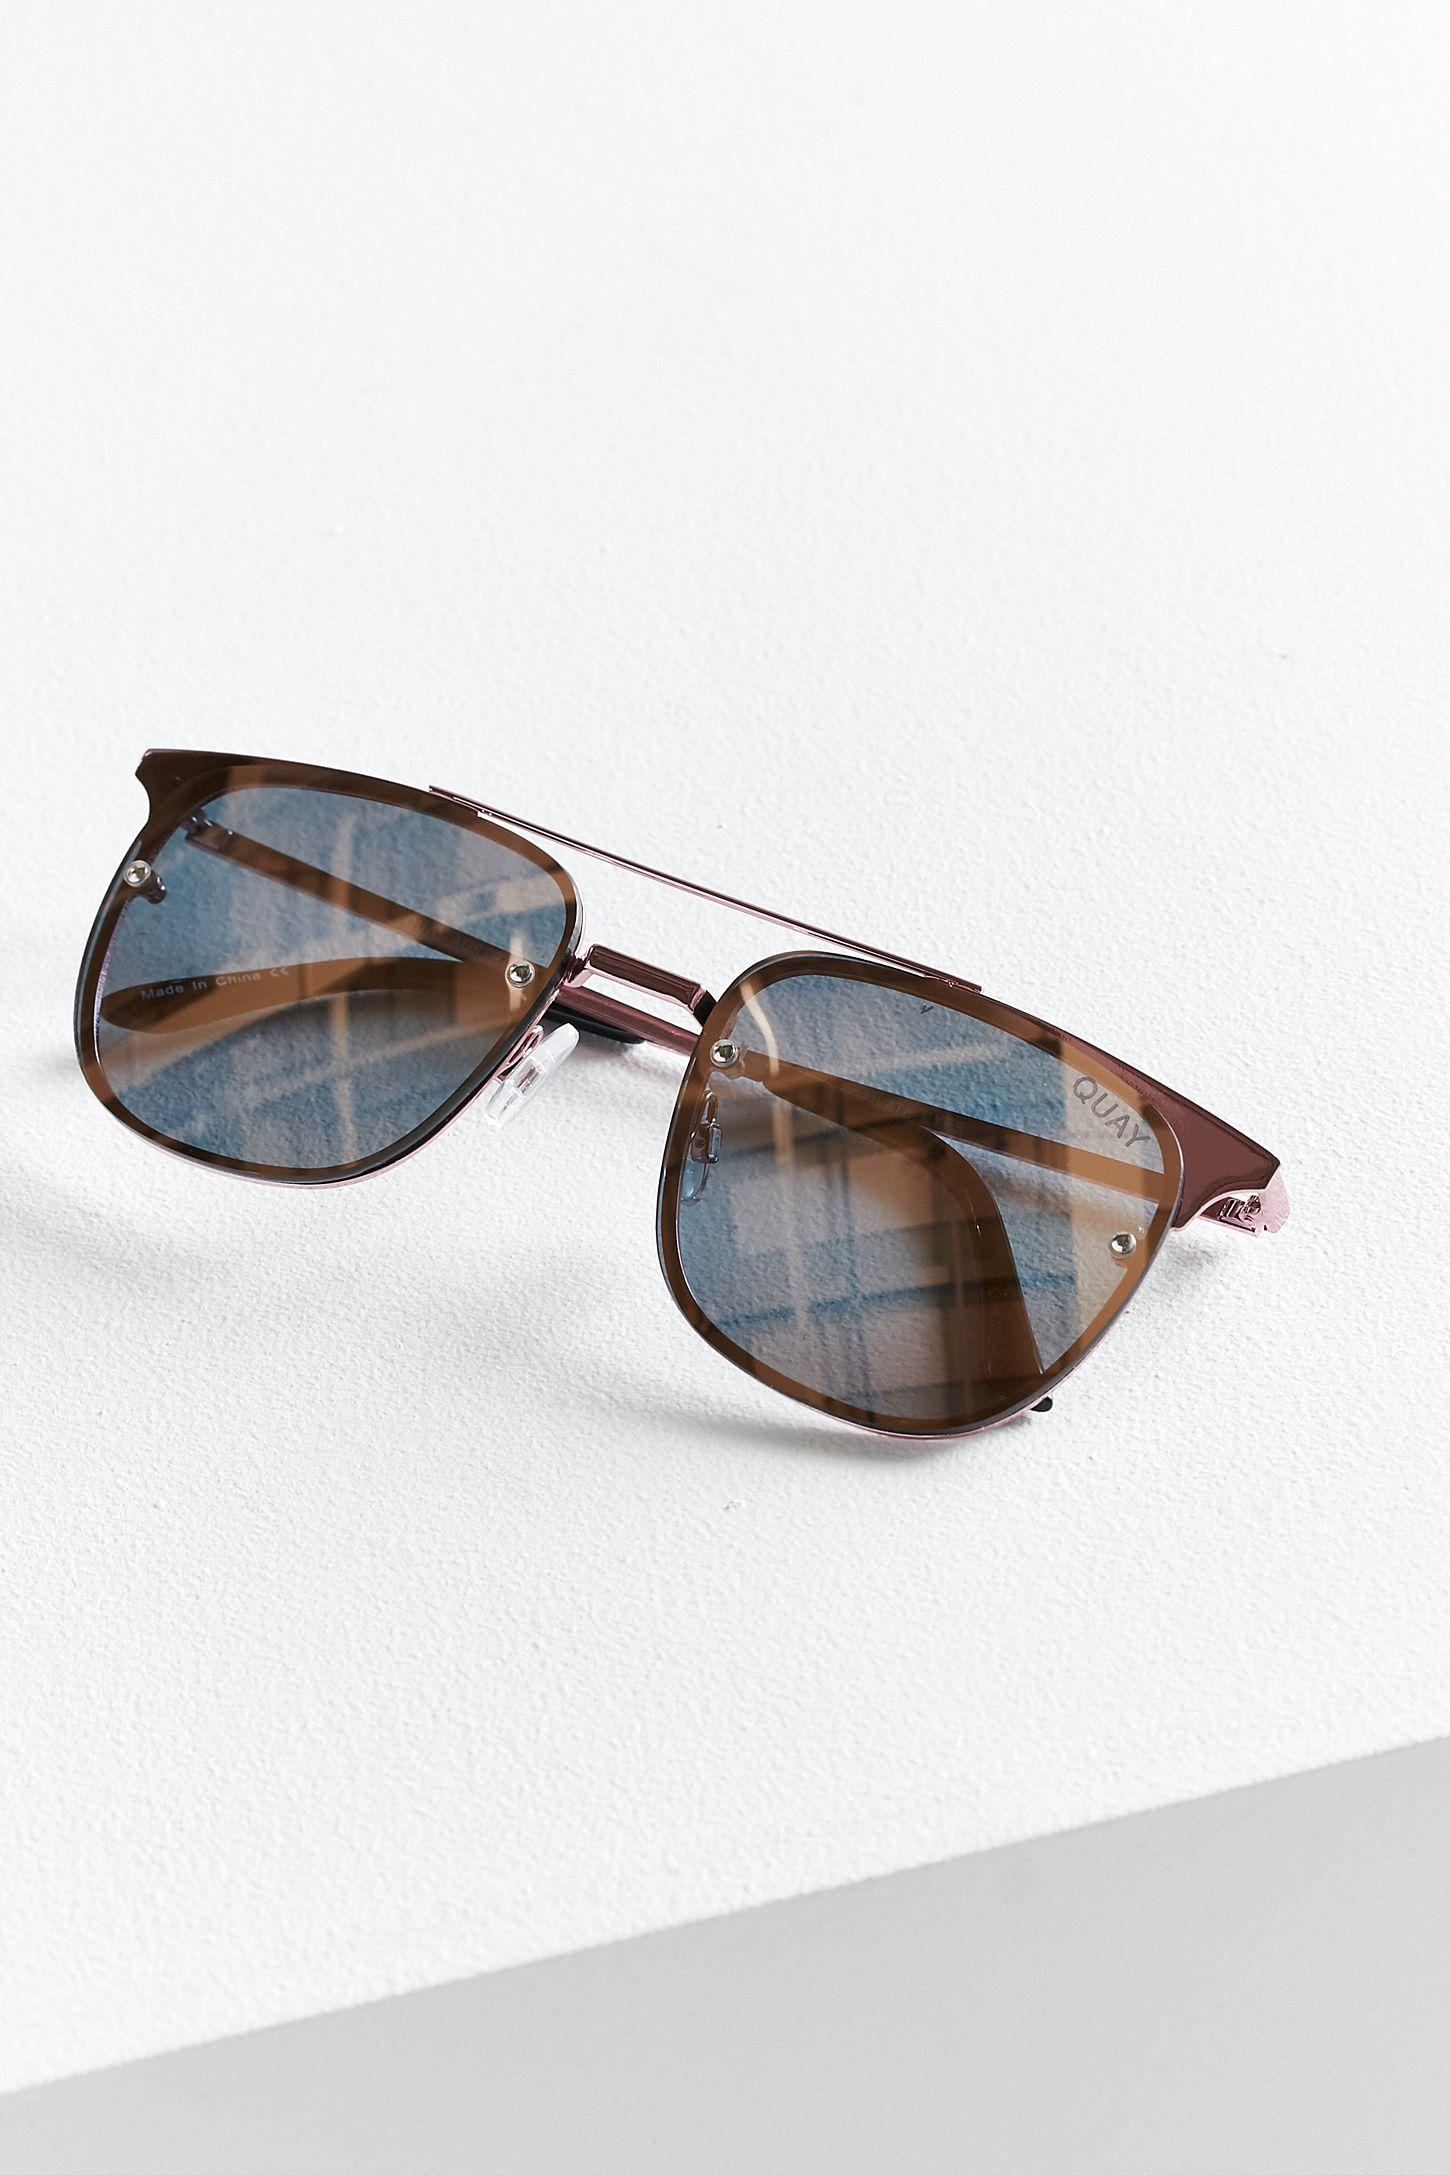 ba7b5ab0dd3a7 Quay Private Eyes Aviator Sunglasses